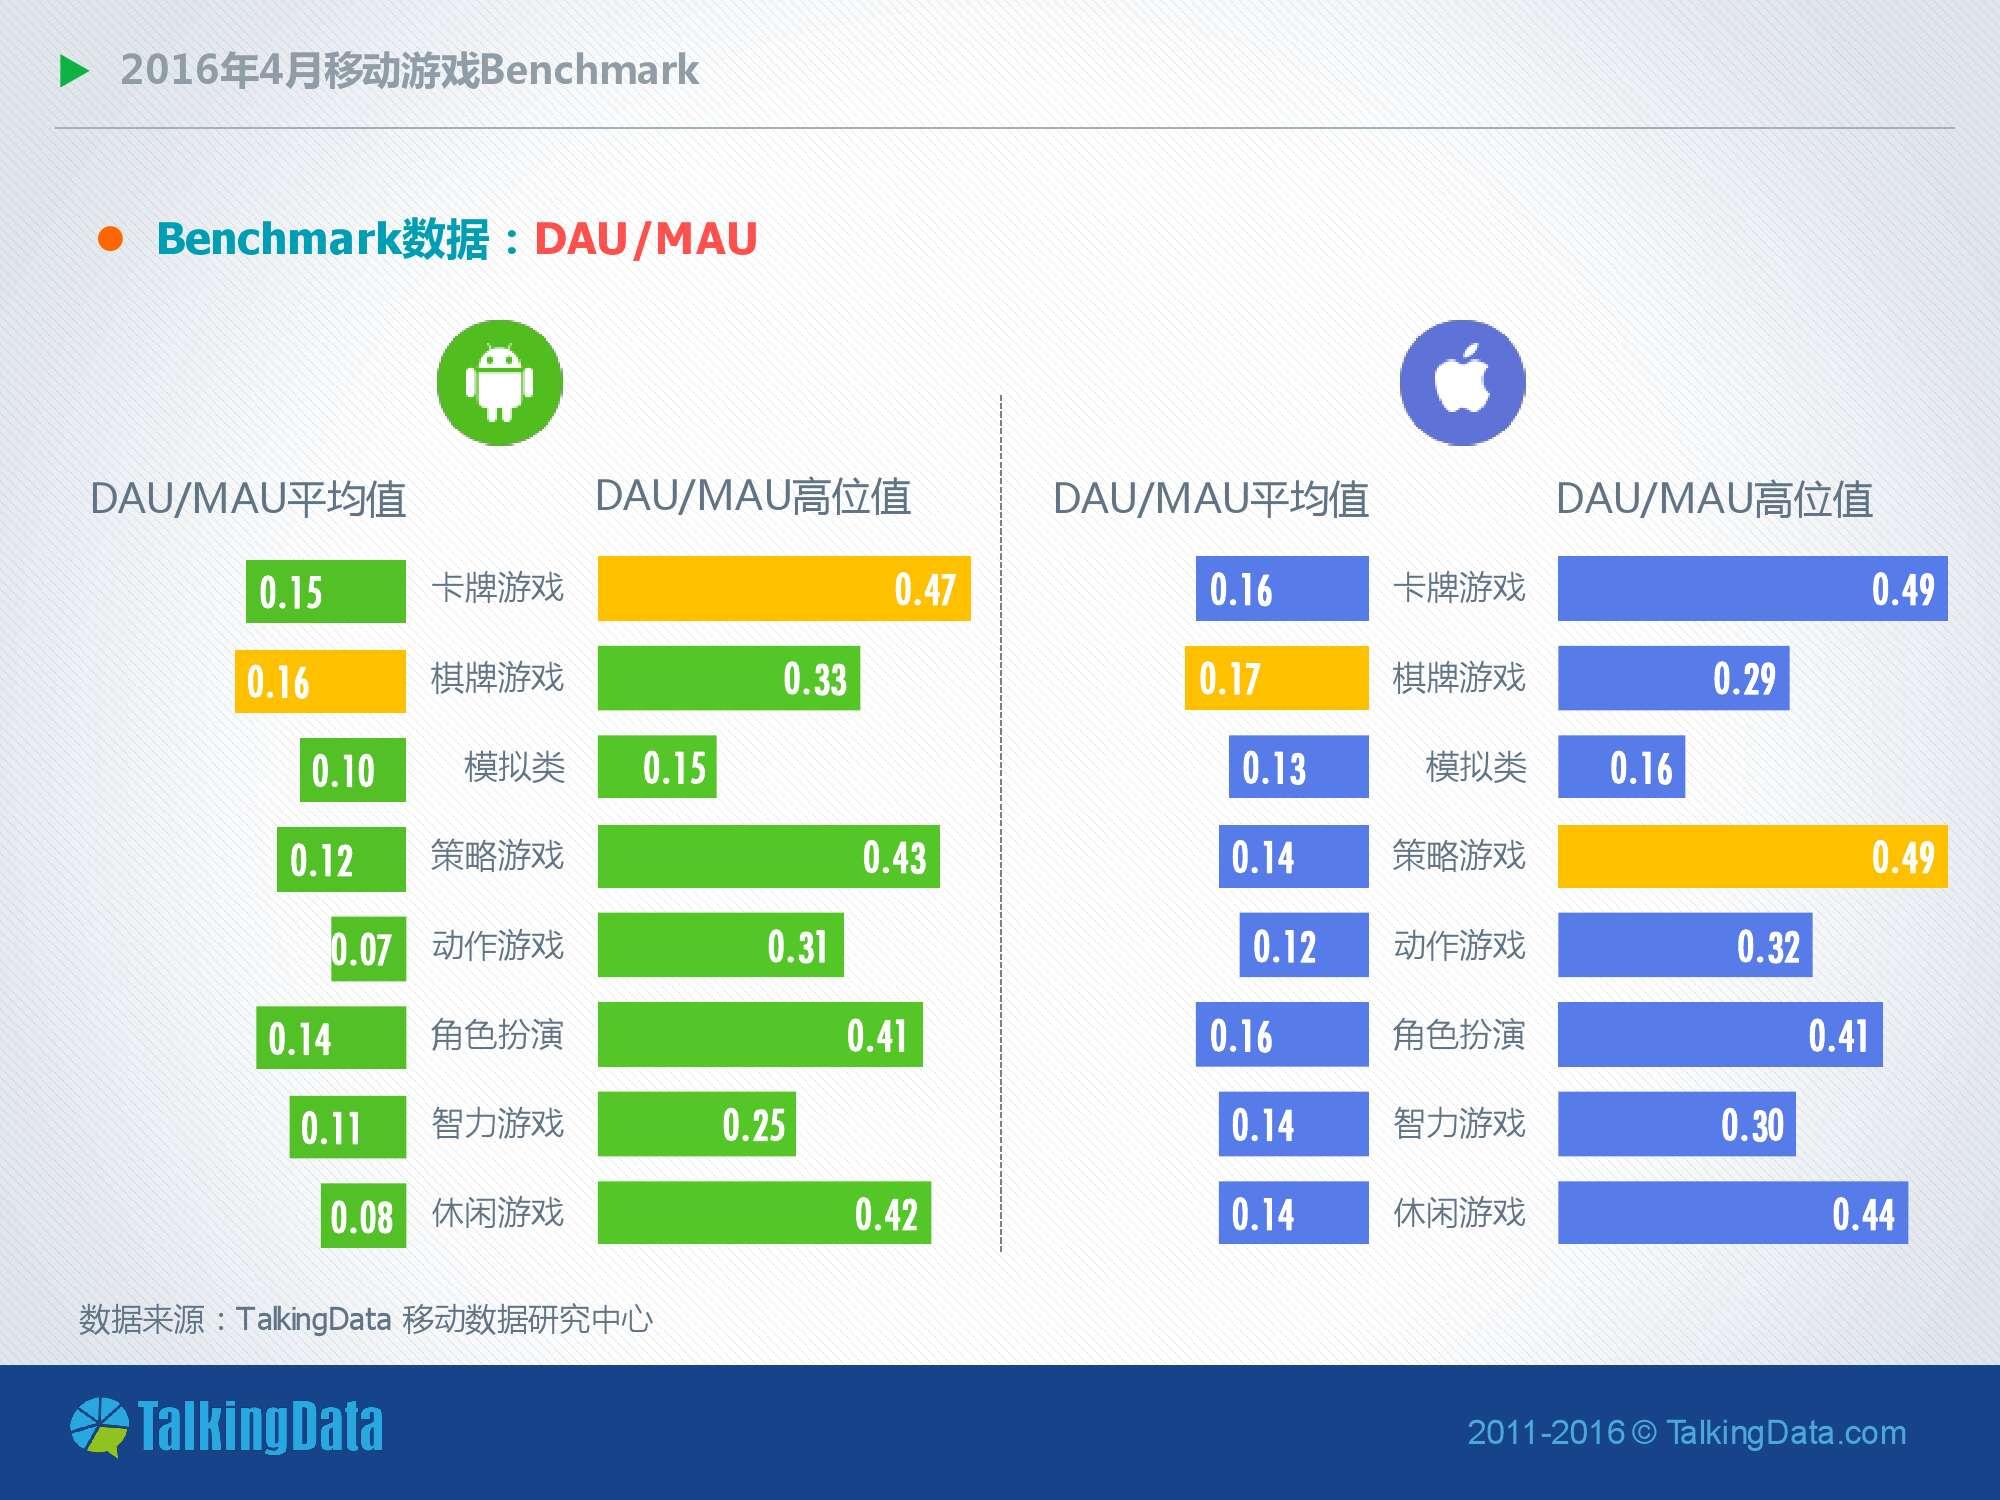 TalkingData-2016年4月移动游戏Benchmark指标数据_000005